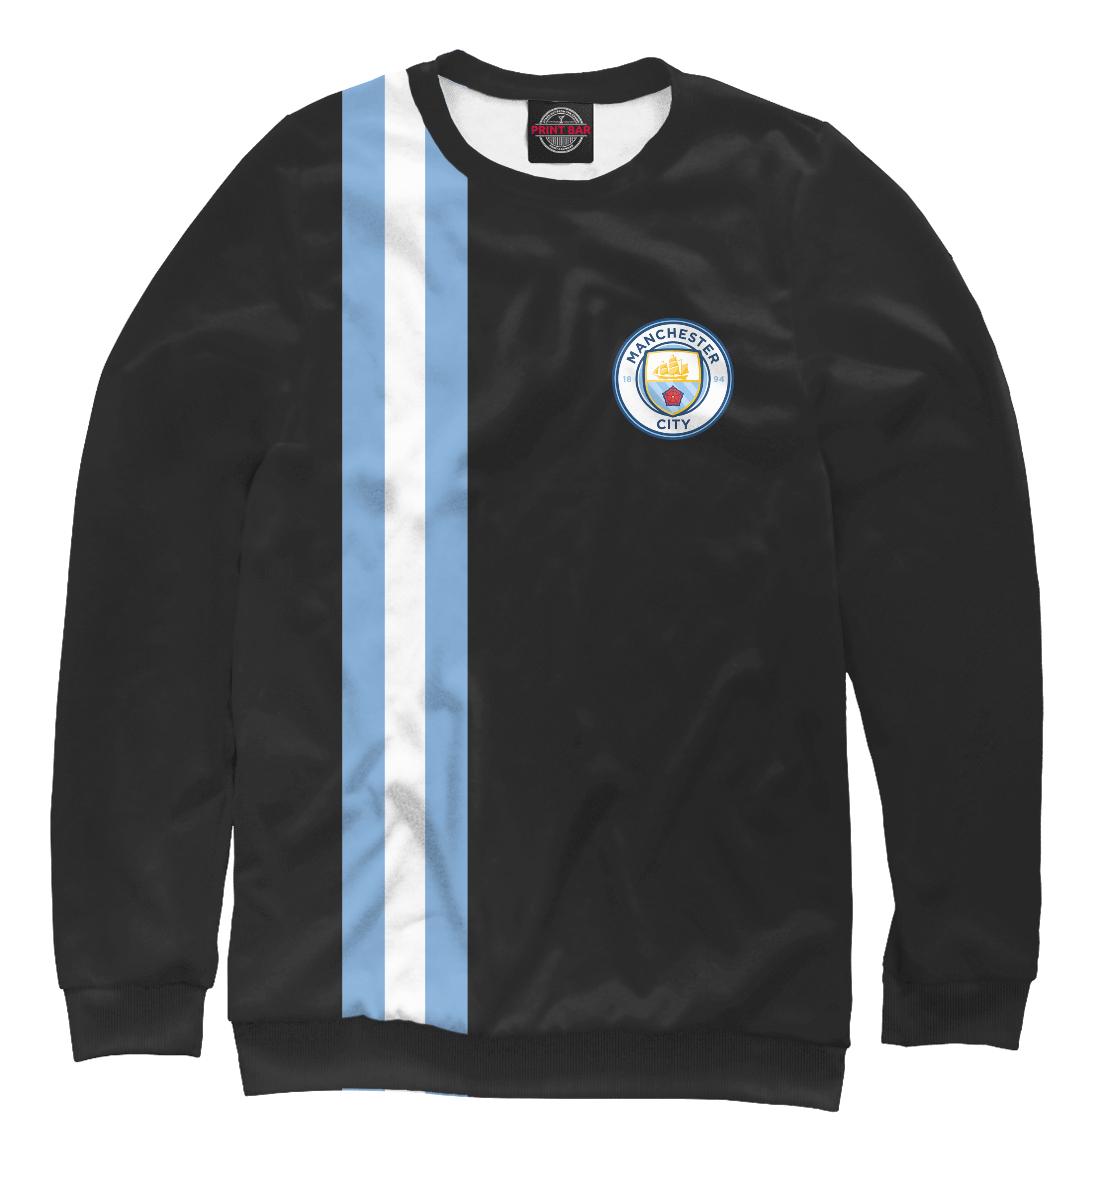 Купить Manchester City Line Collection, Printbar, Свитшоты, MNC-900517-swi-2